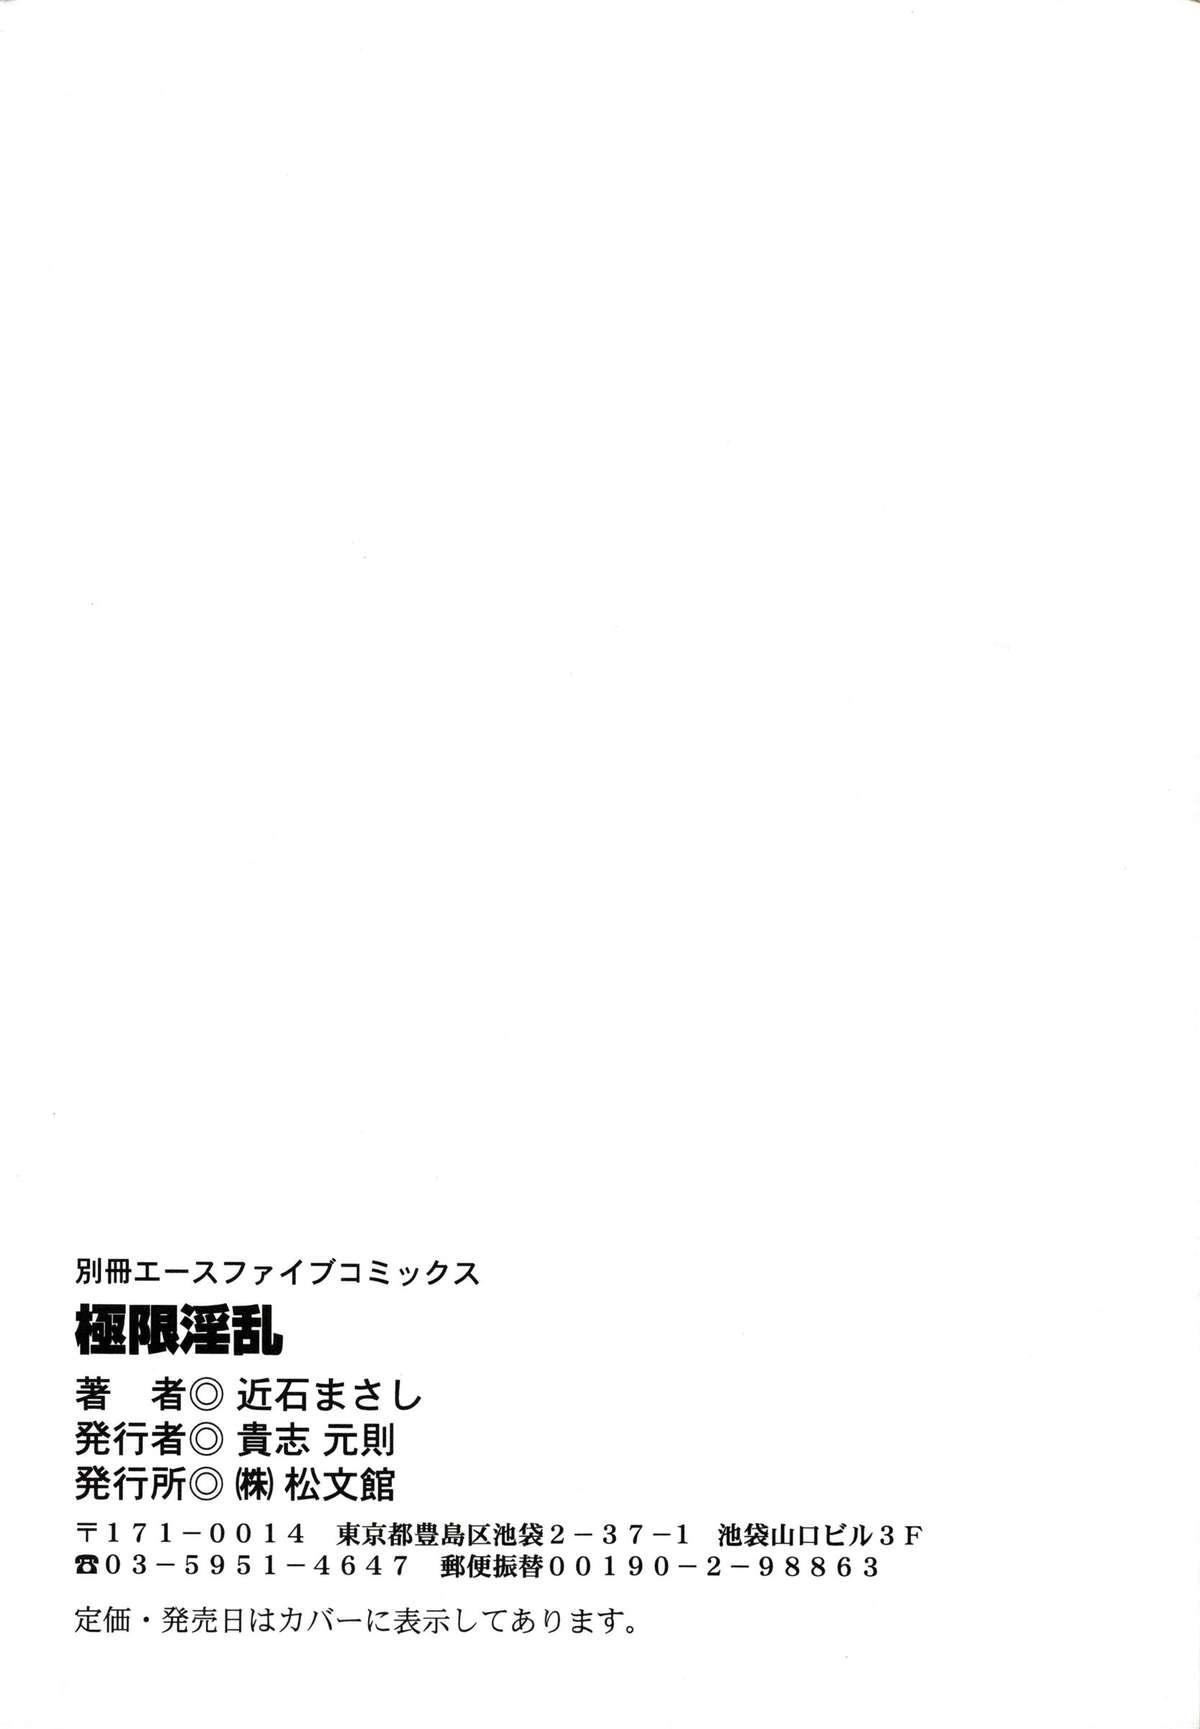 Kyokugen Inran 152